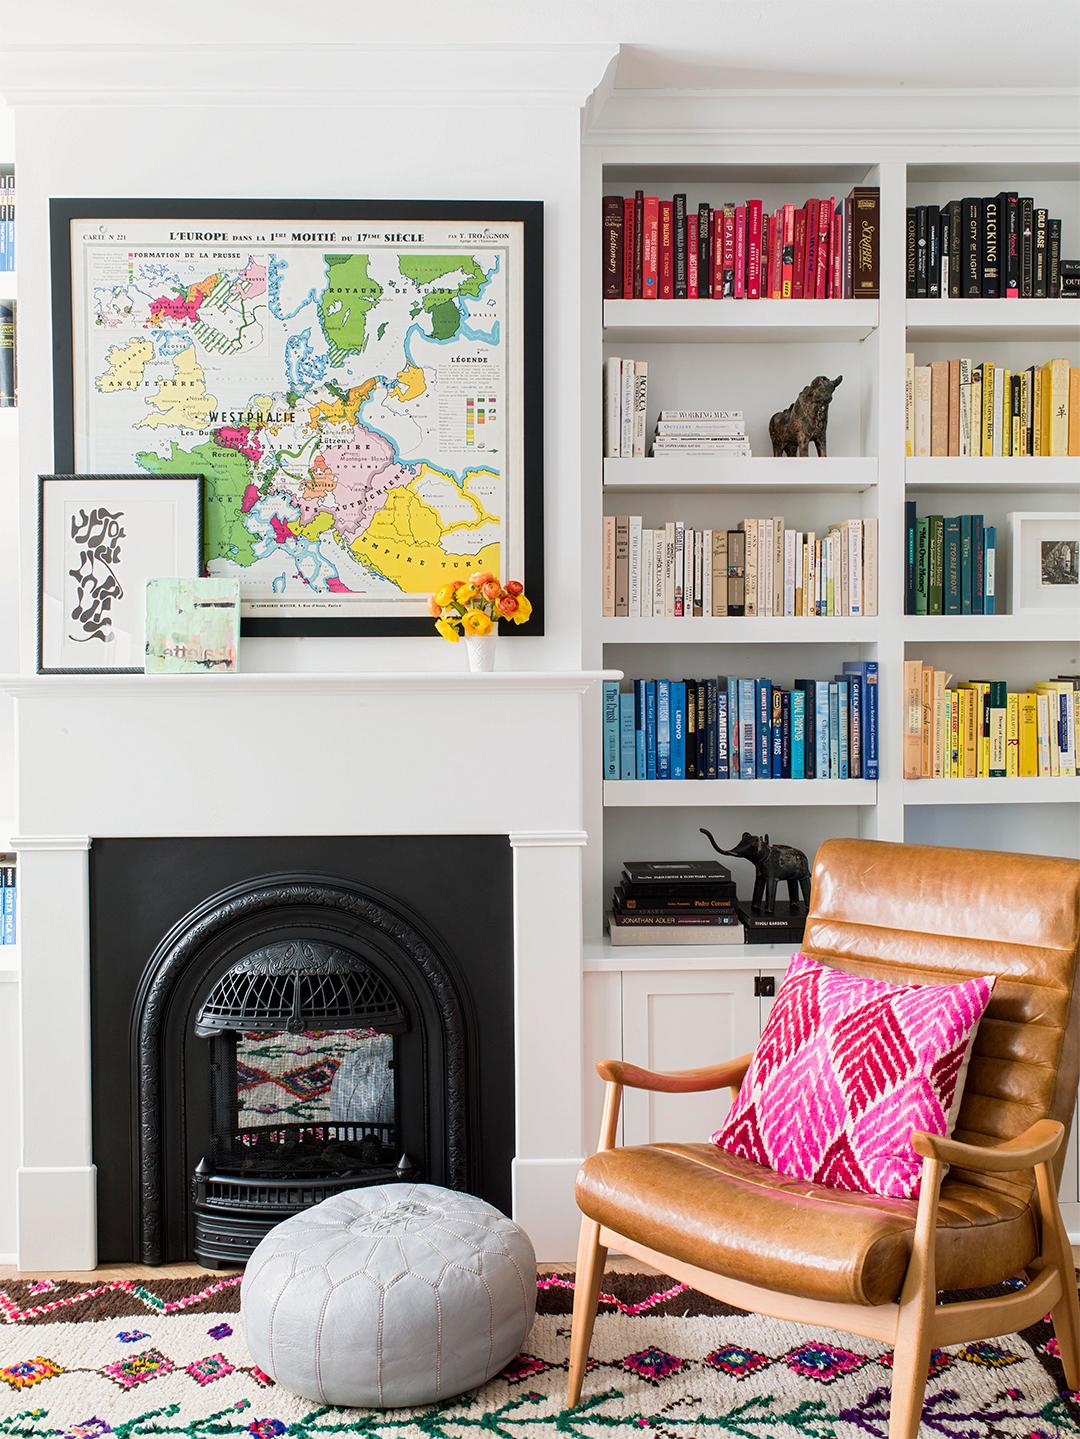 Unique frame for Fireplace Mantel